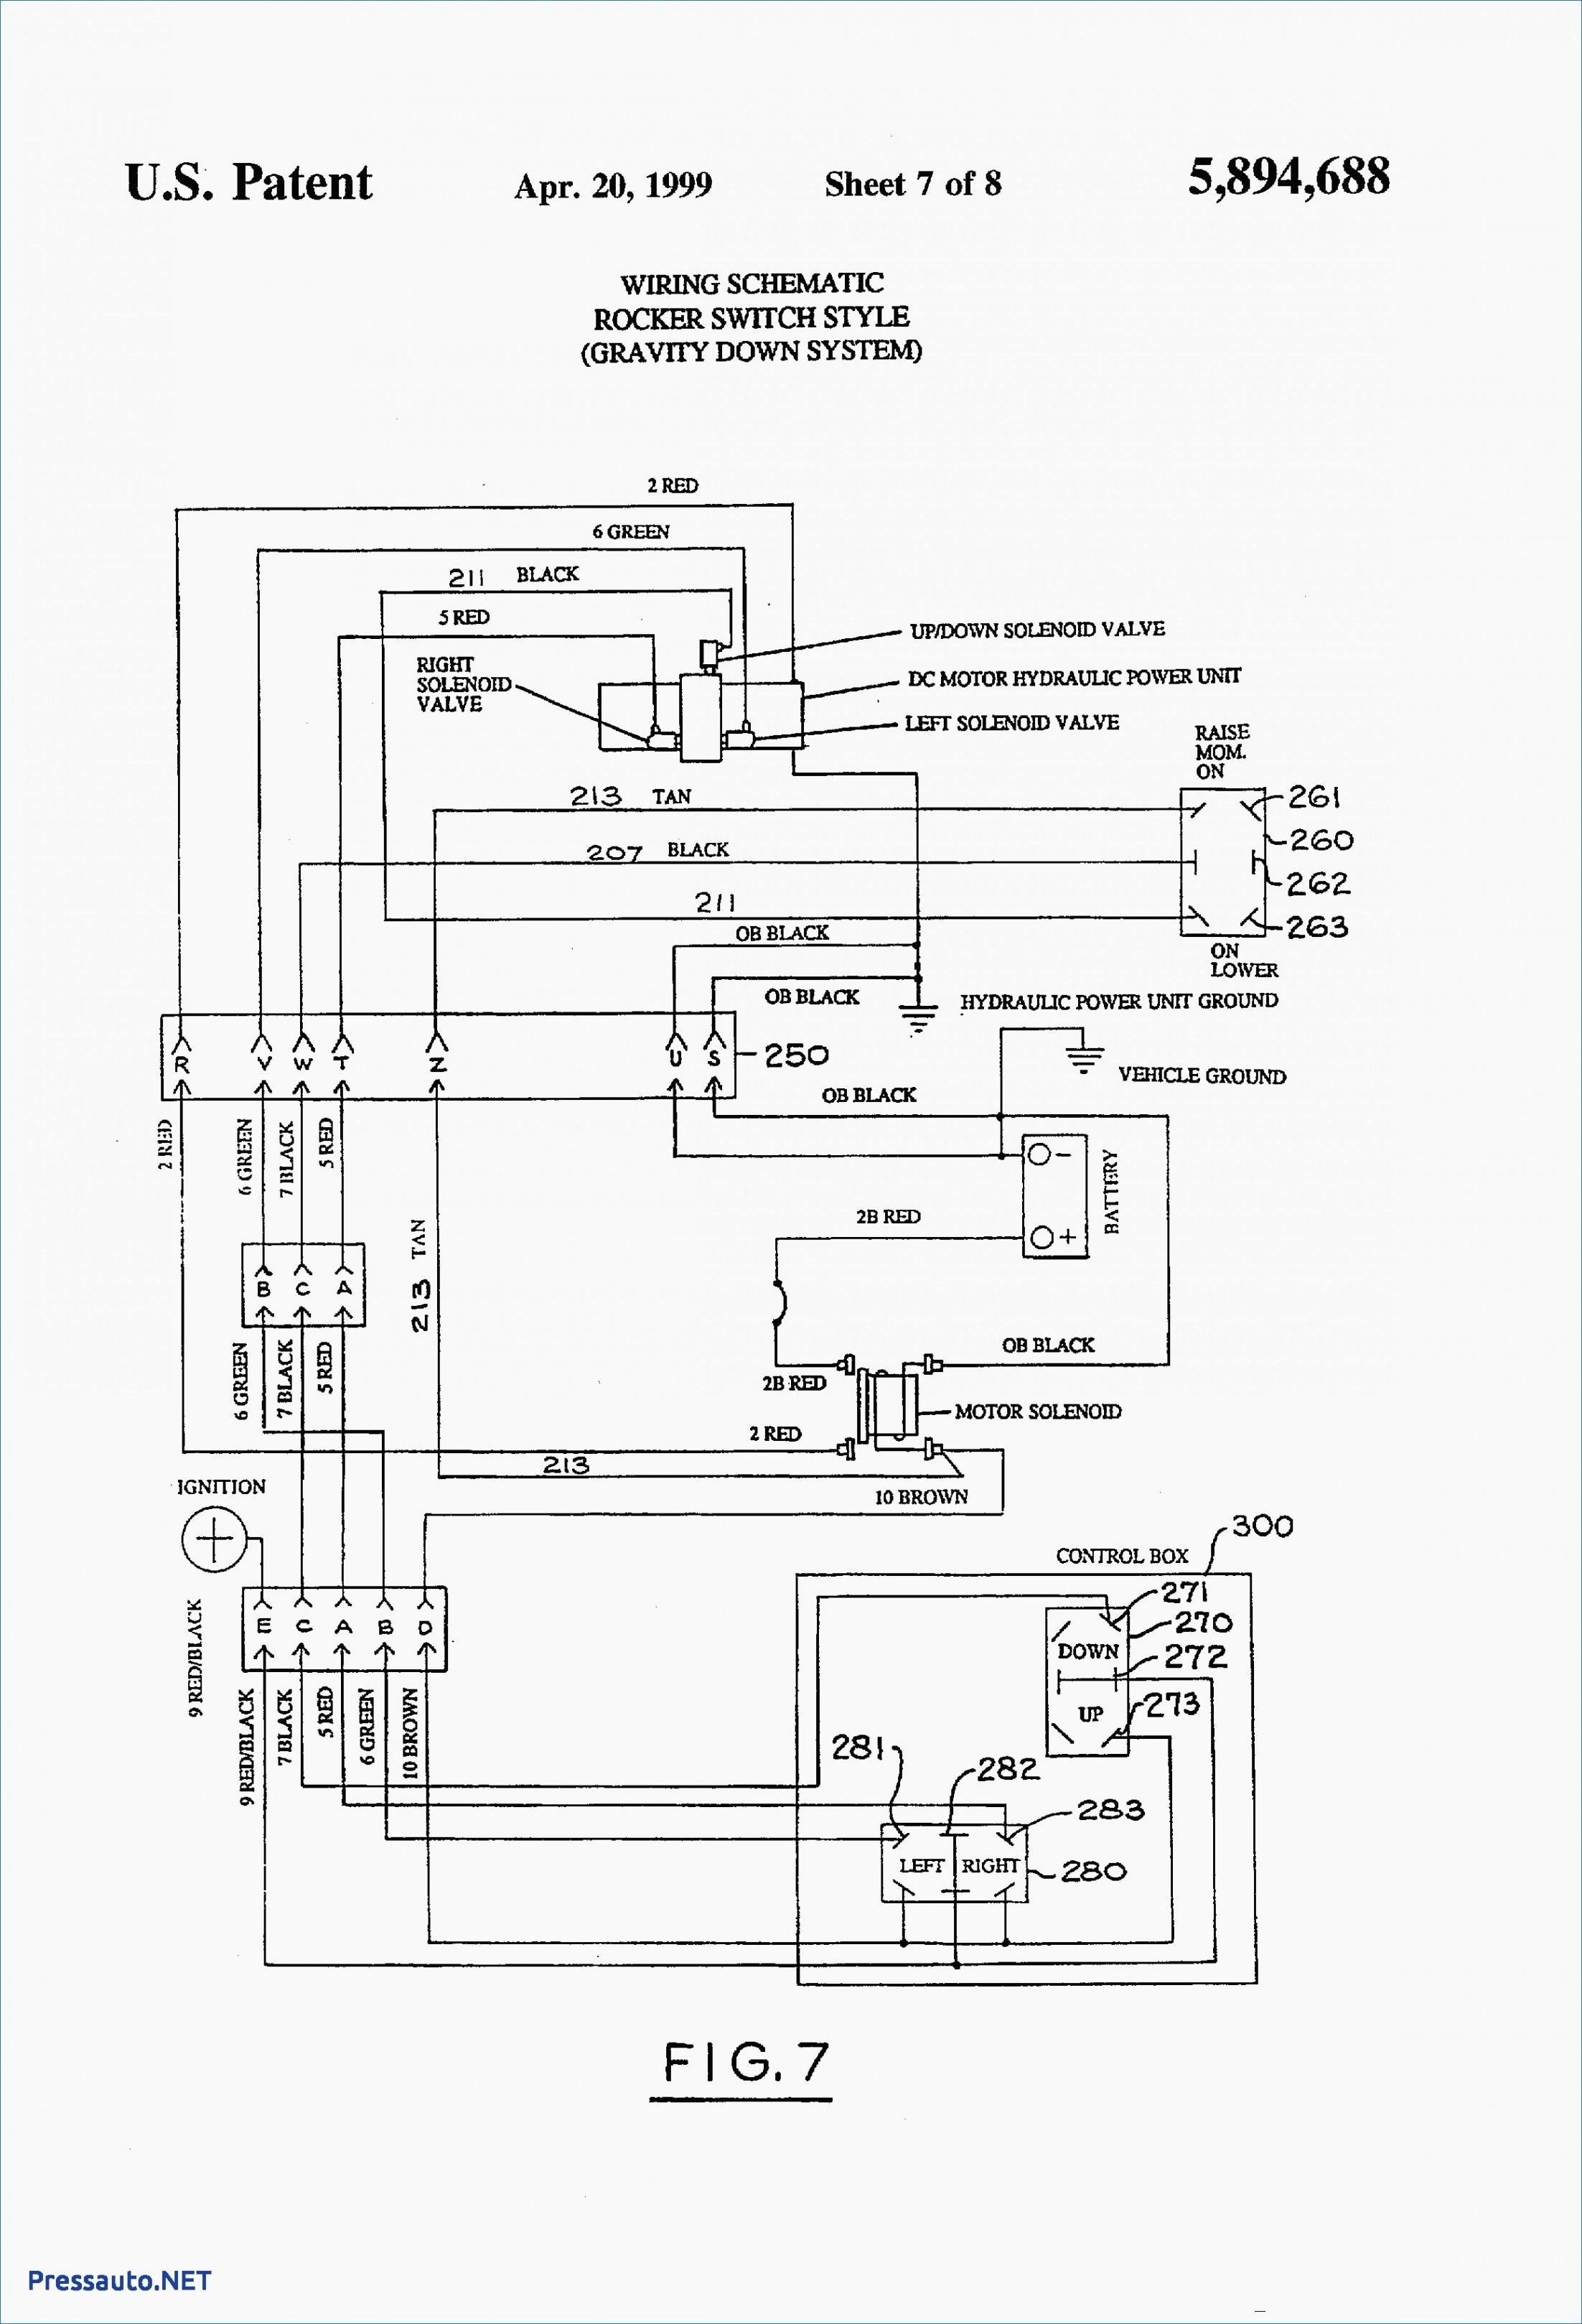 Western Unimount Plow Wiring Diagram - Shahsramblings - Western Plow Wiring Diagram